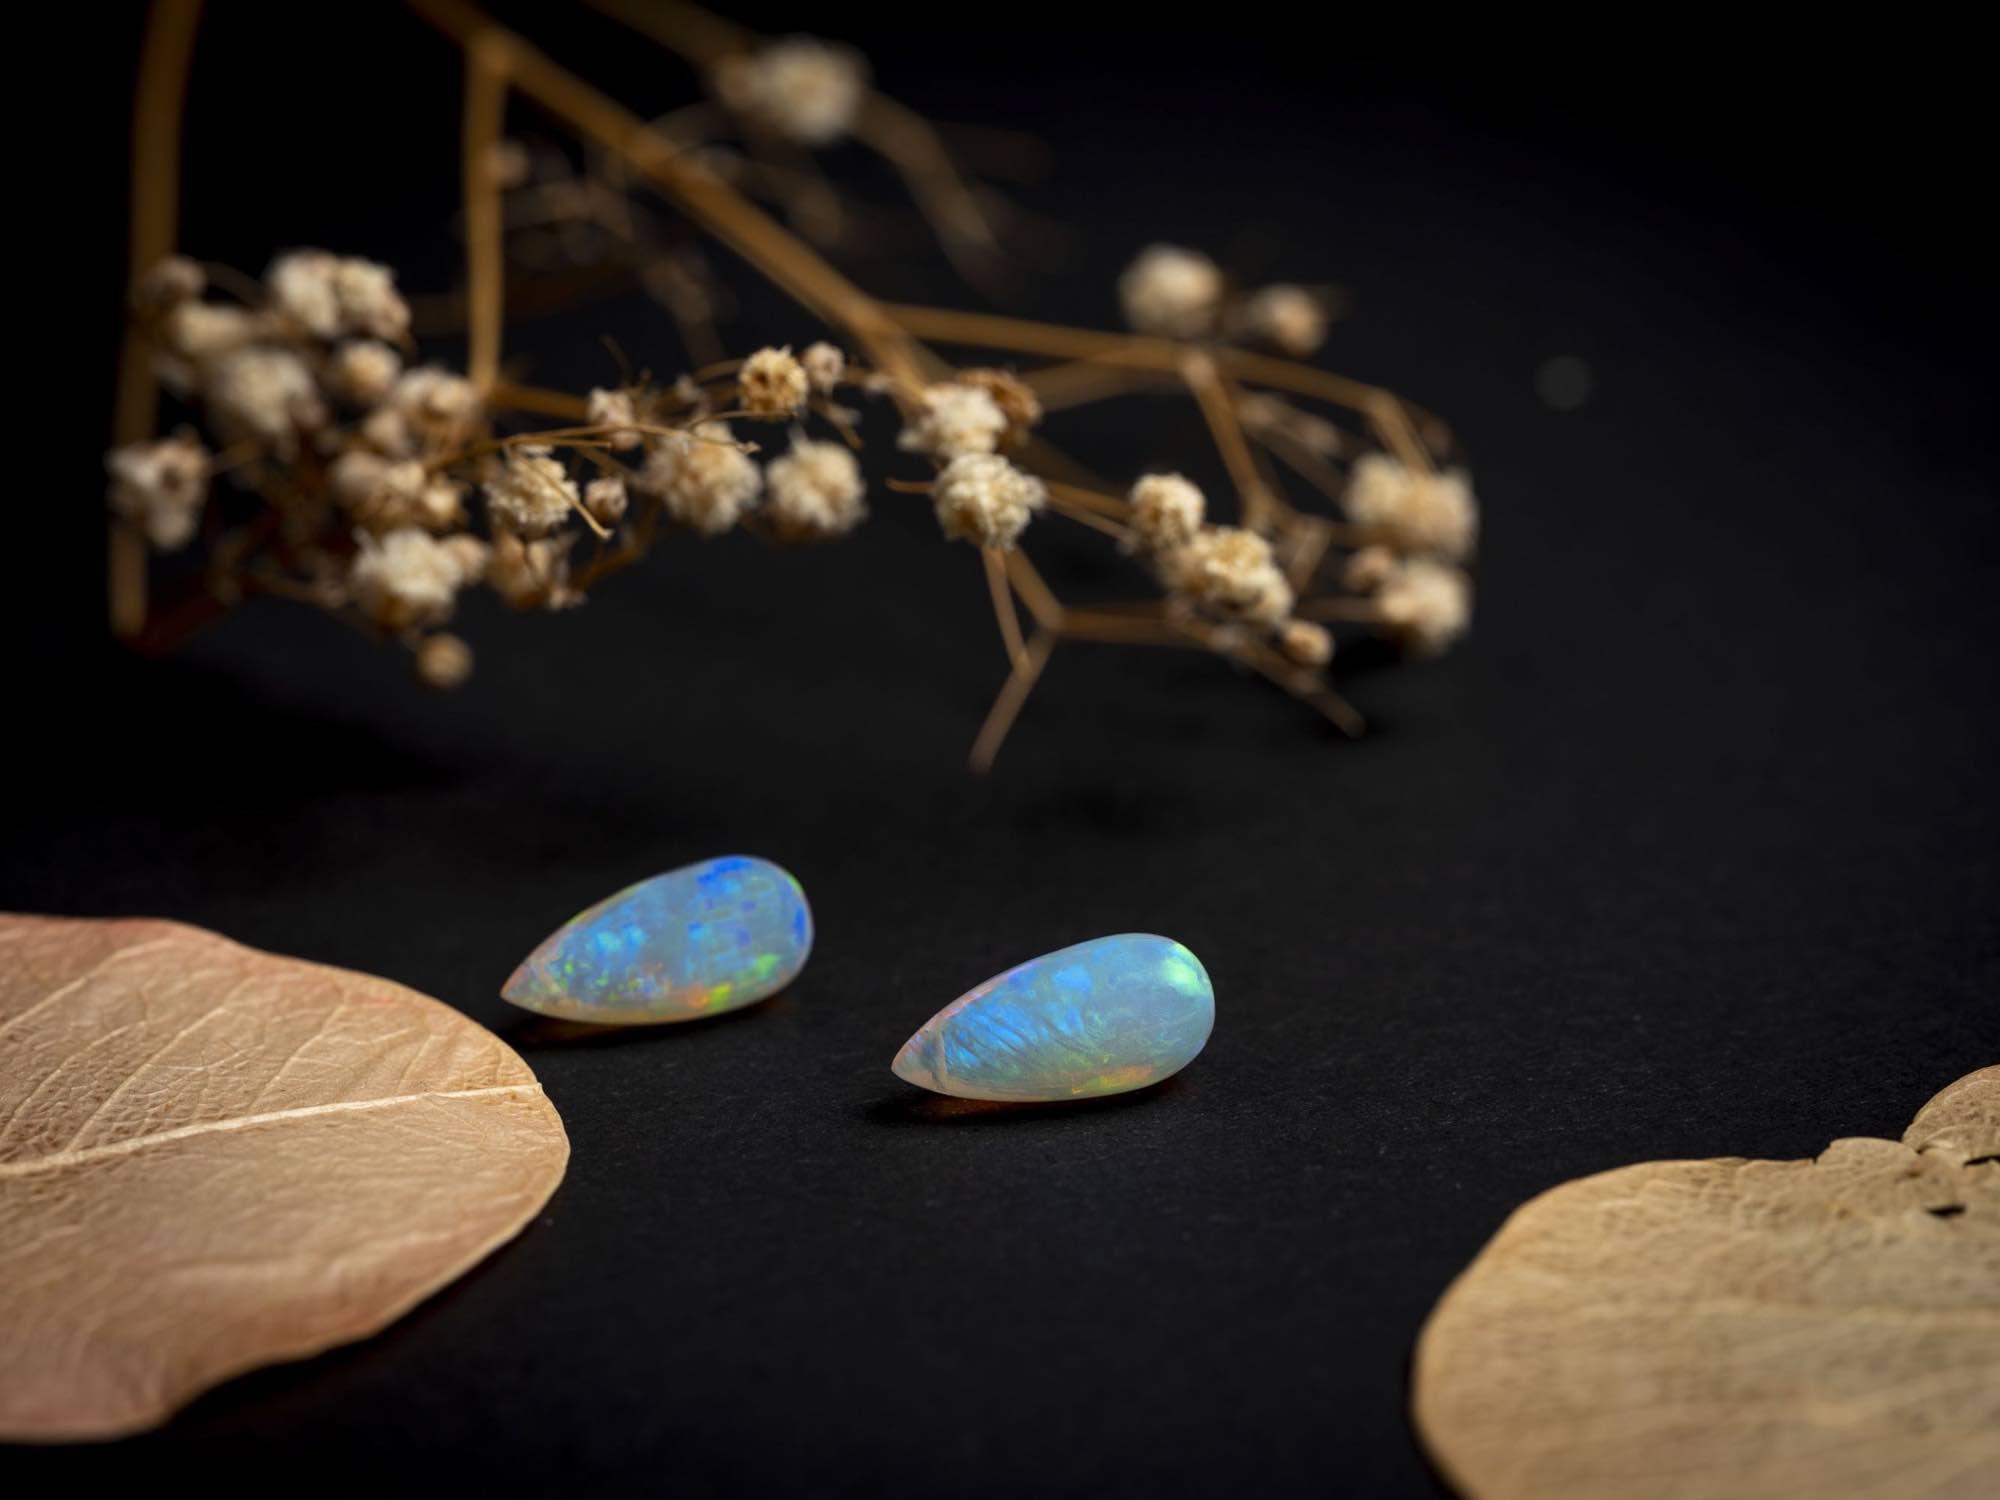 Jewellery Product Photography Singapore Jose Jeuland 2